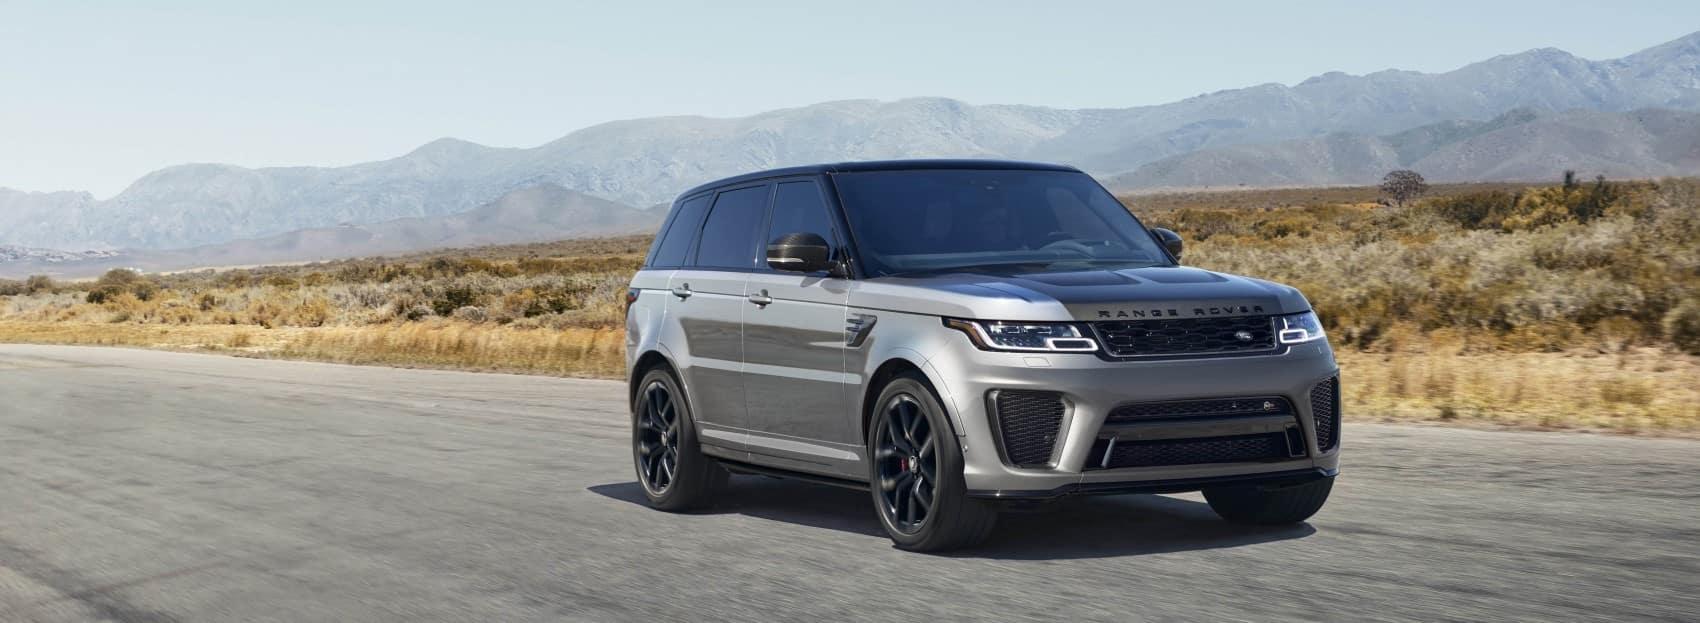 Range Rover Sport Reviews